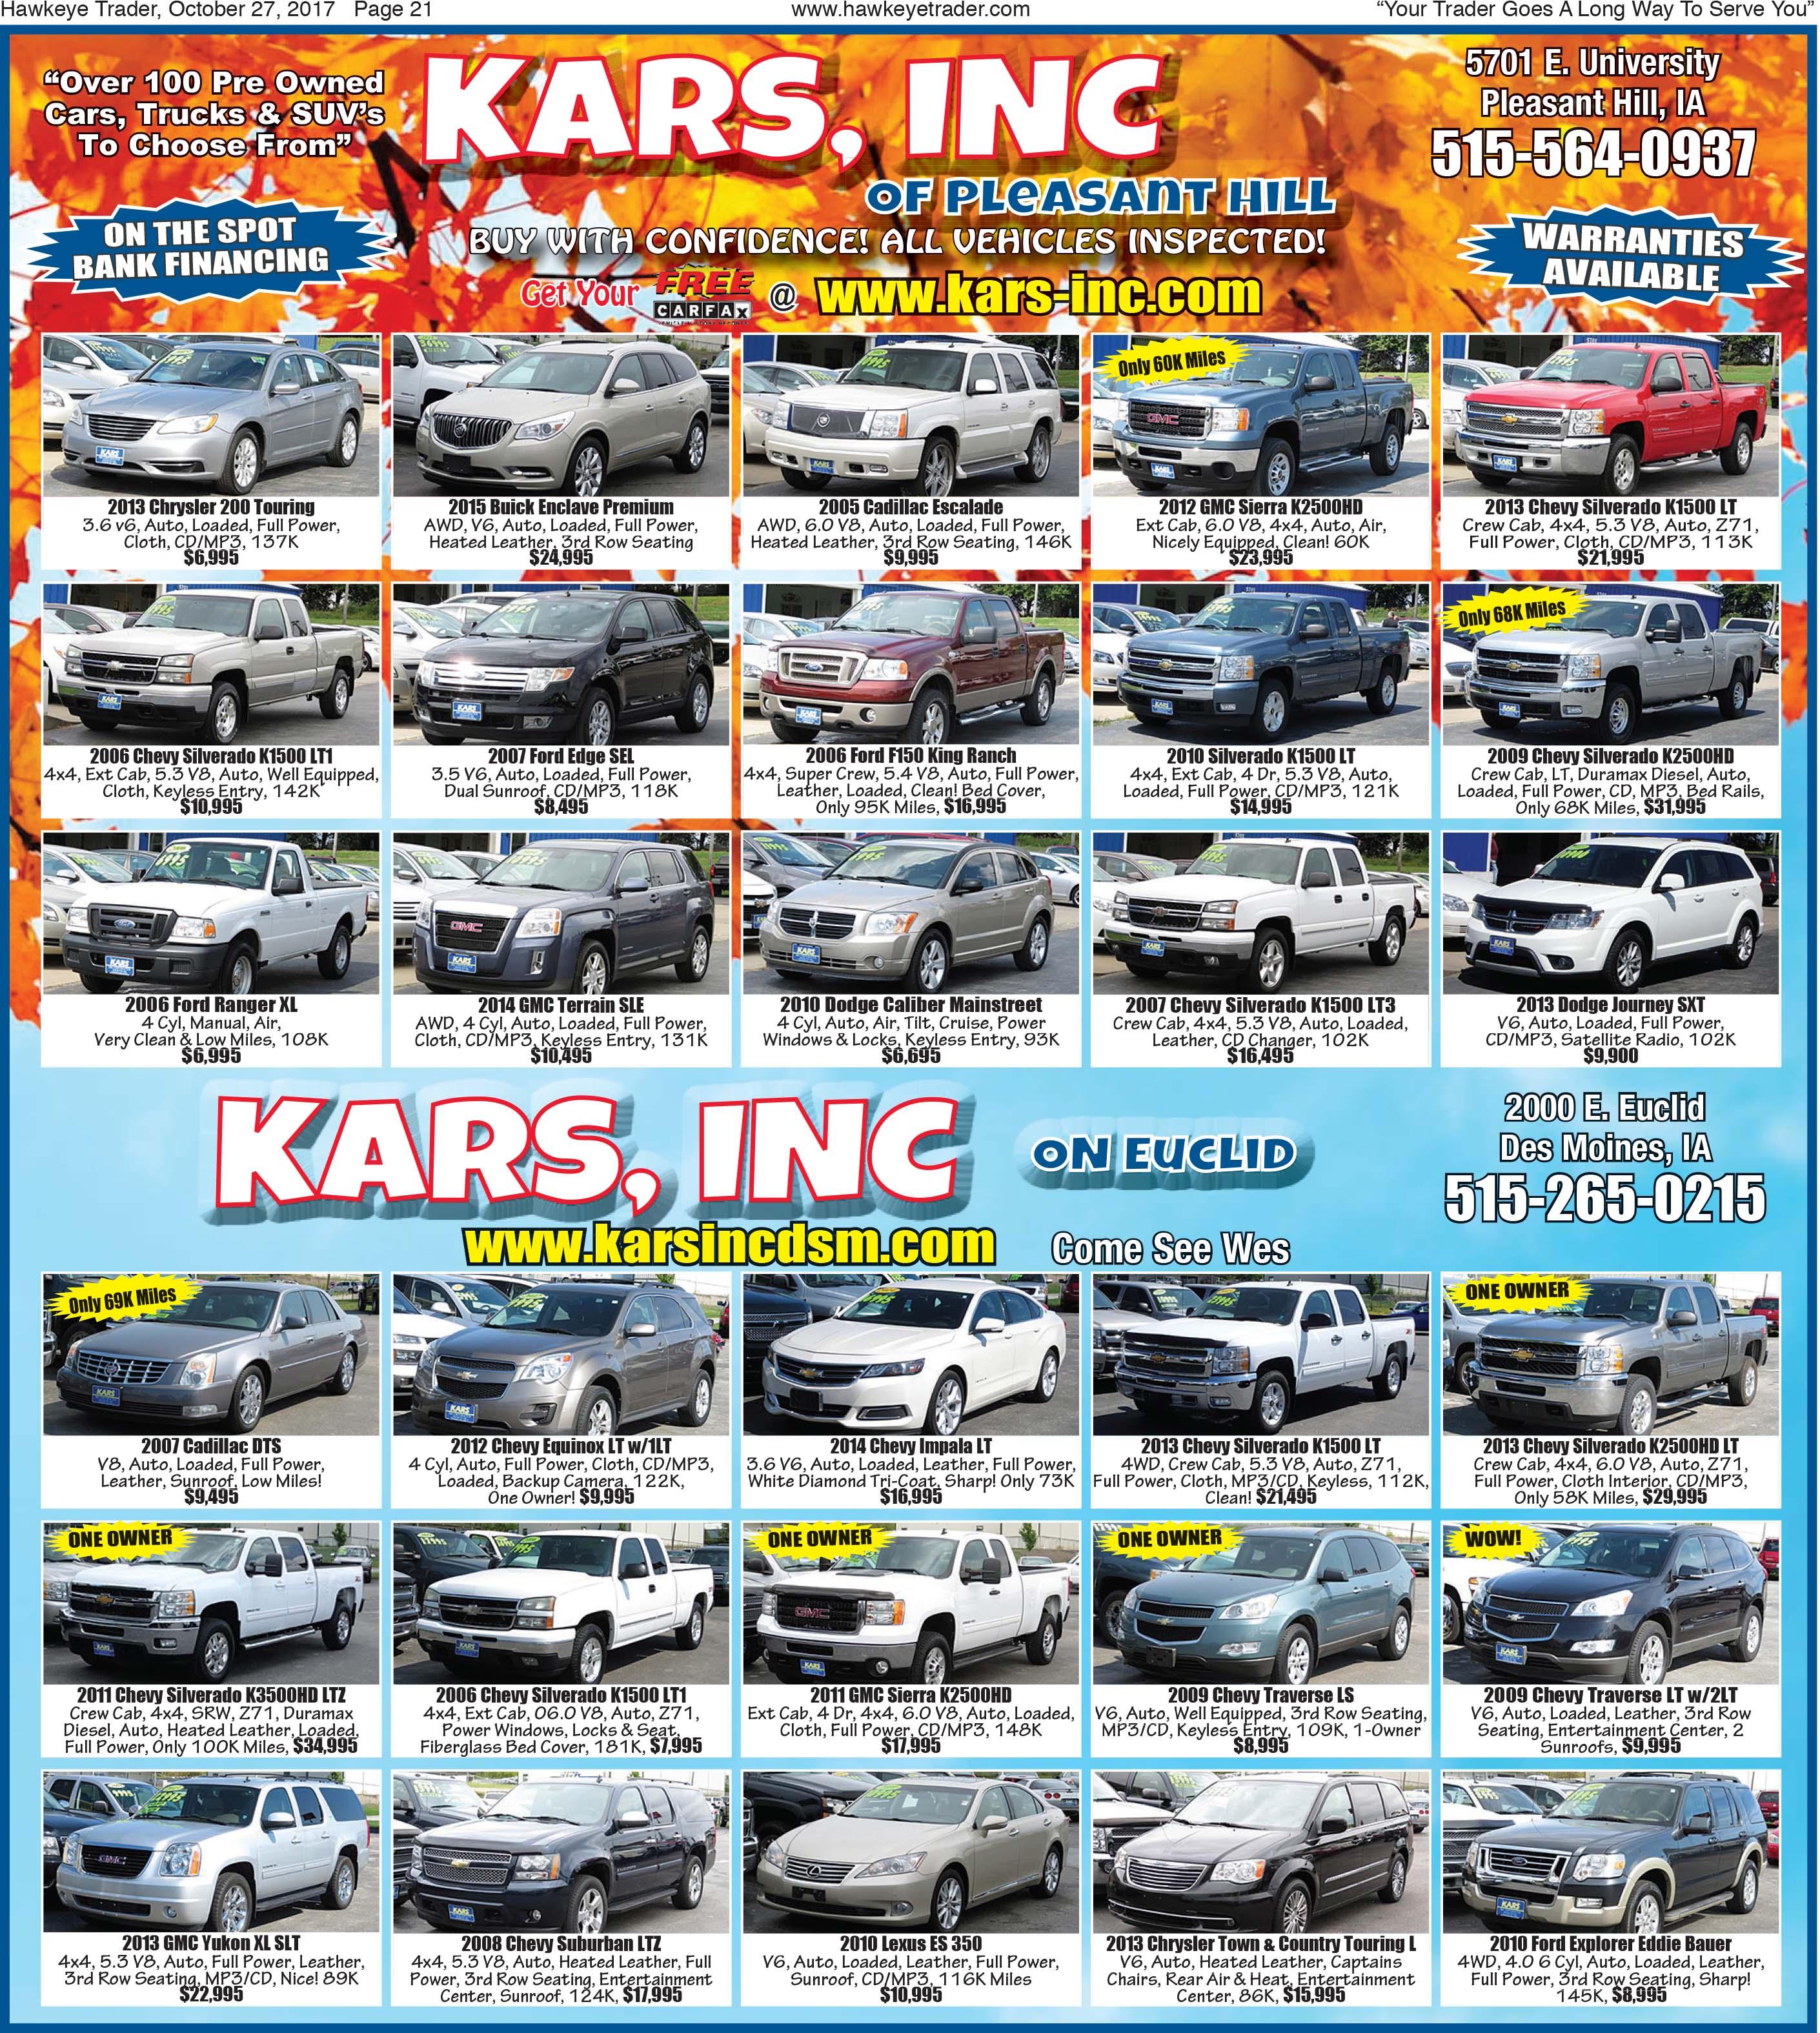 October 27 2017 2005 Chevrolet Silverado Keyless Entry Wiring Diagram Click To Open Image